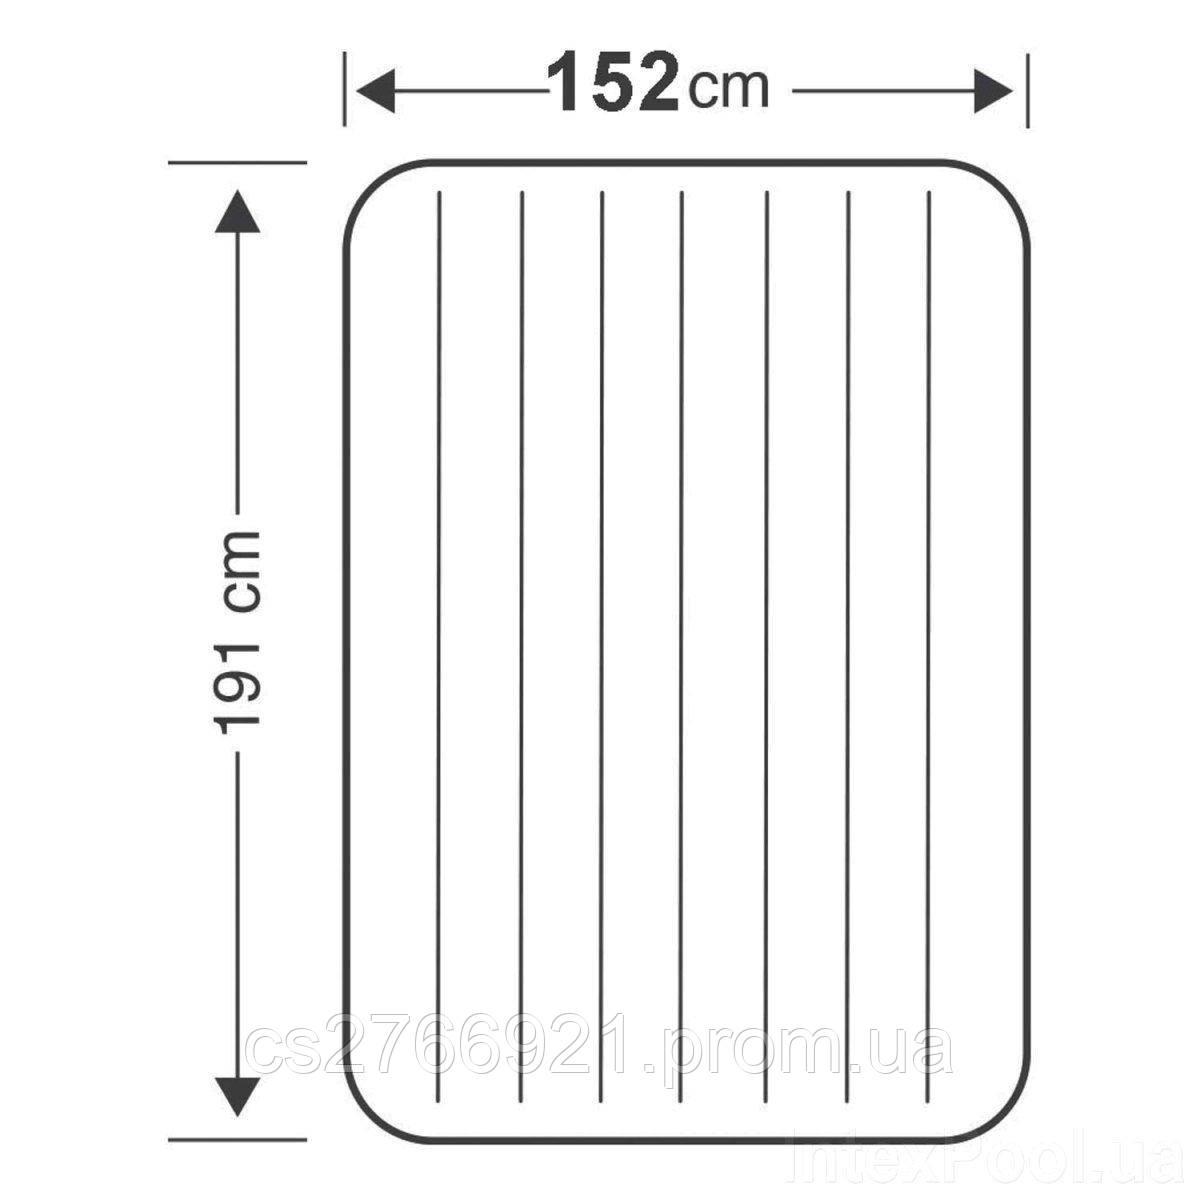 Надувной матрас Intex 68759, 152 х 203 х 22 см. Двухместный